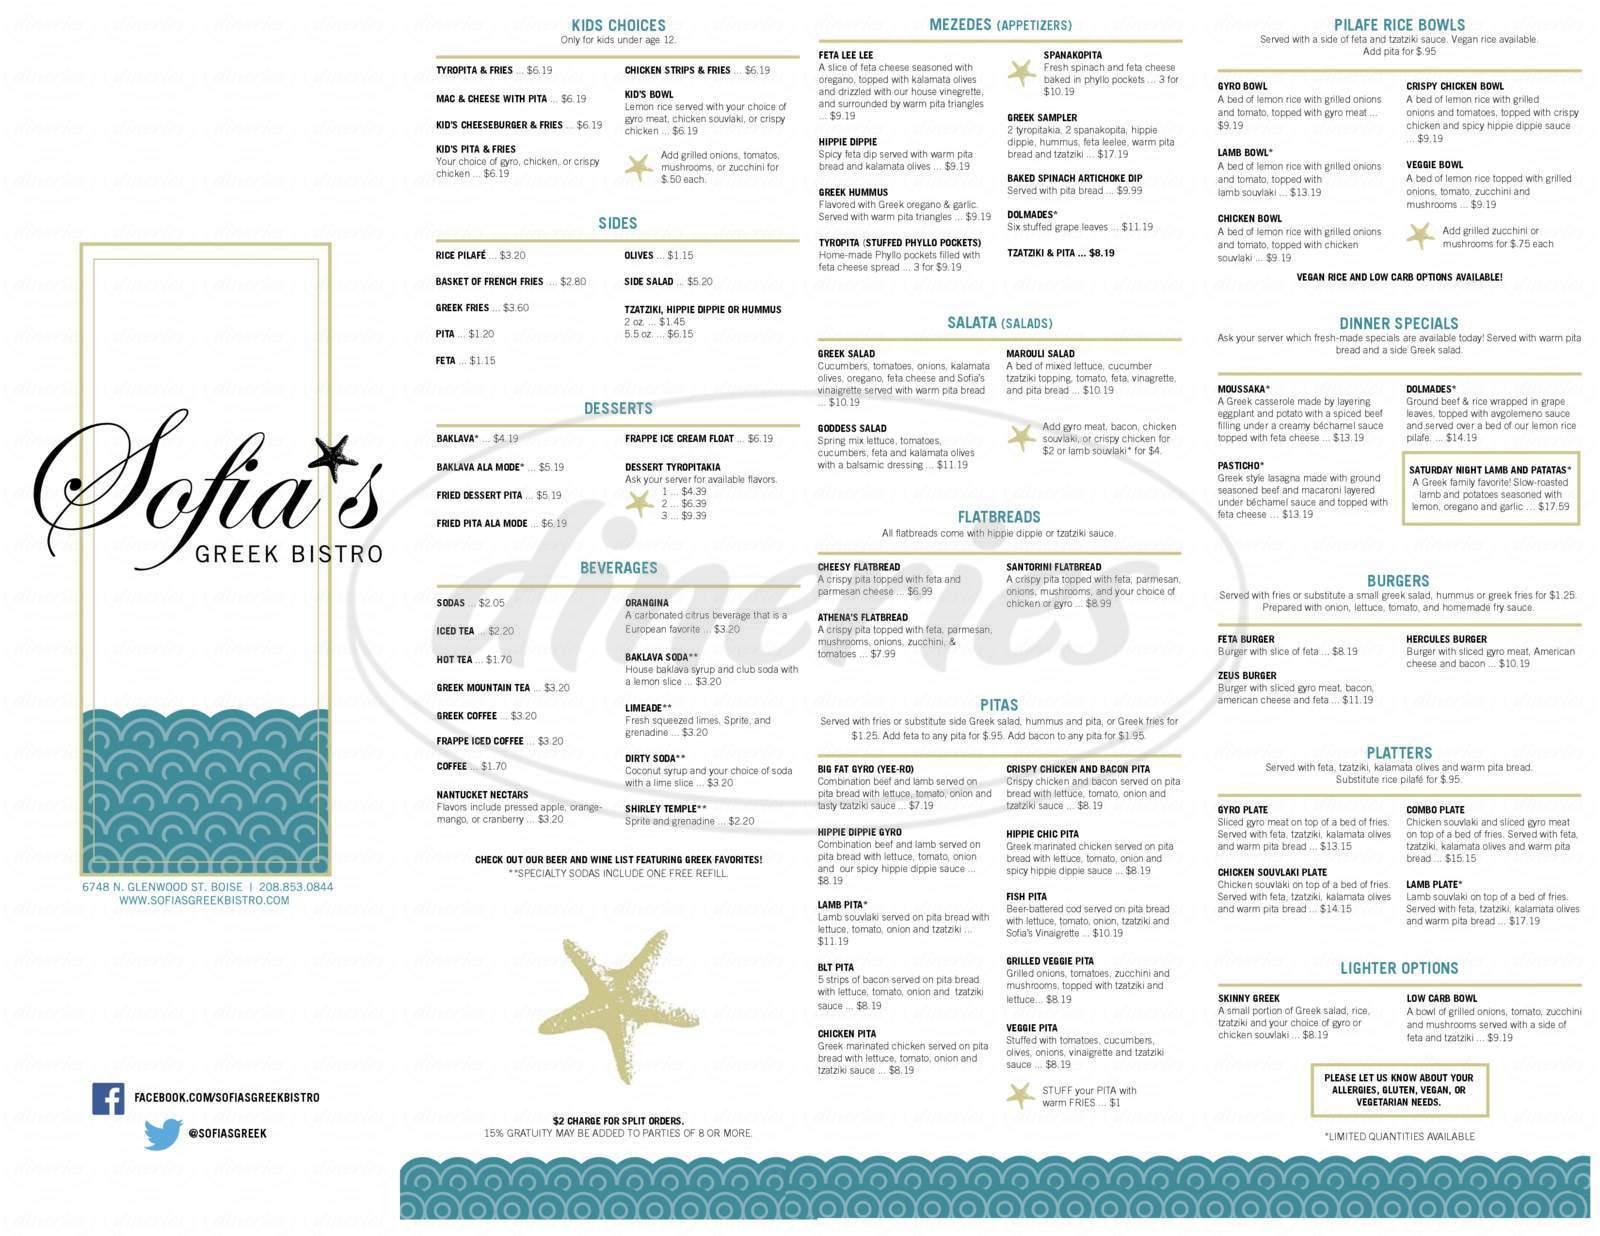 menu for Sofia's Greek Bistro